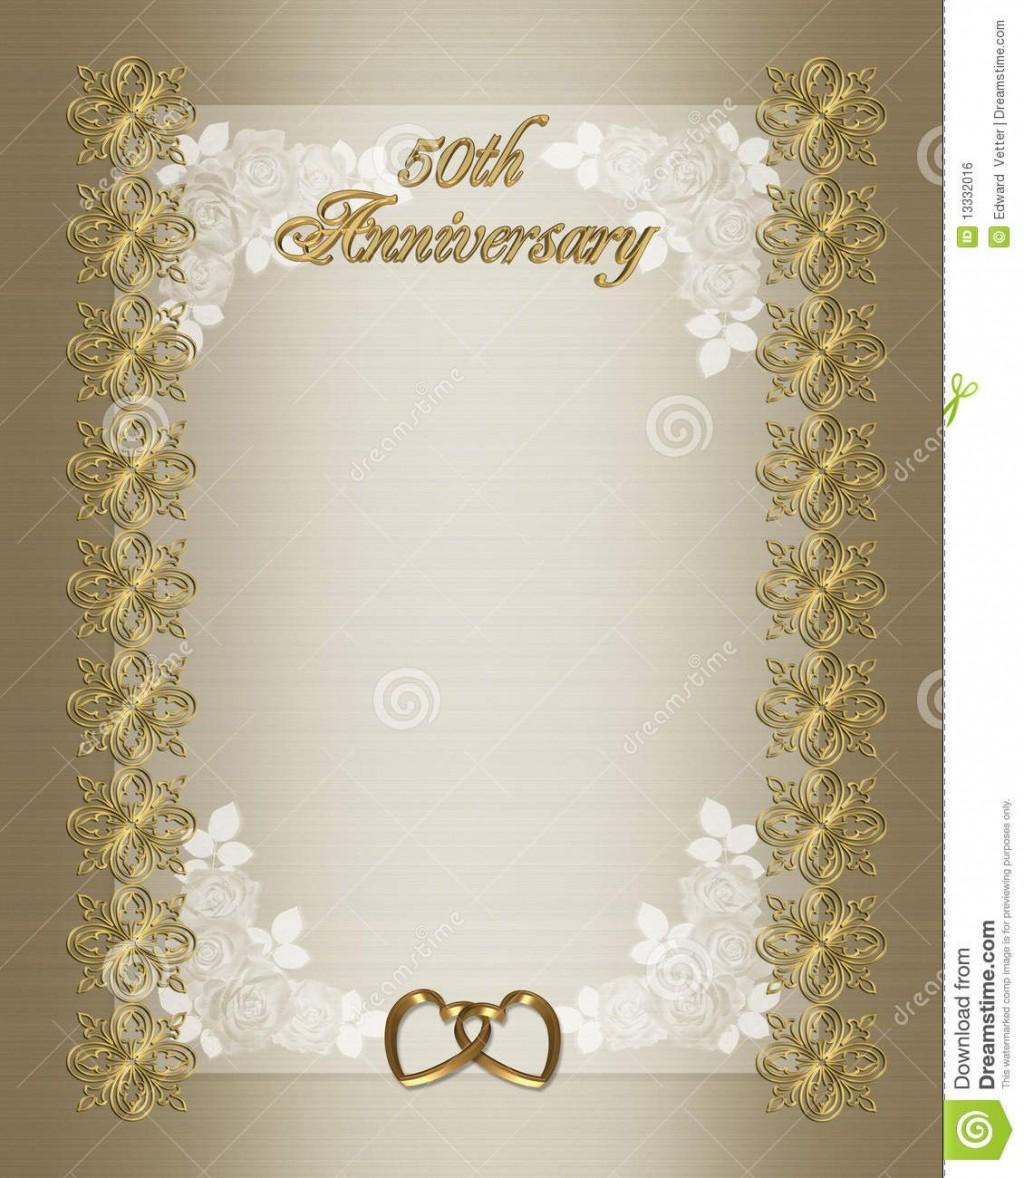 006 Fearsome 50th Anniversary Invitation Template Idea  Wedding Microsoft Word Free DownloadLarge